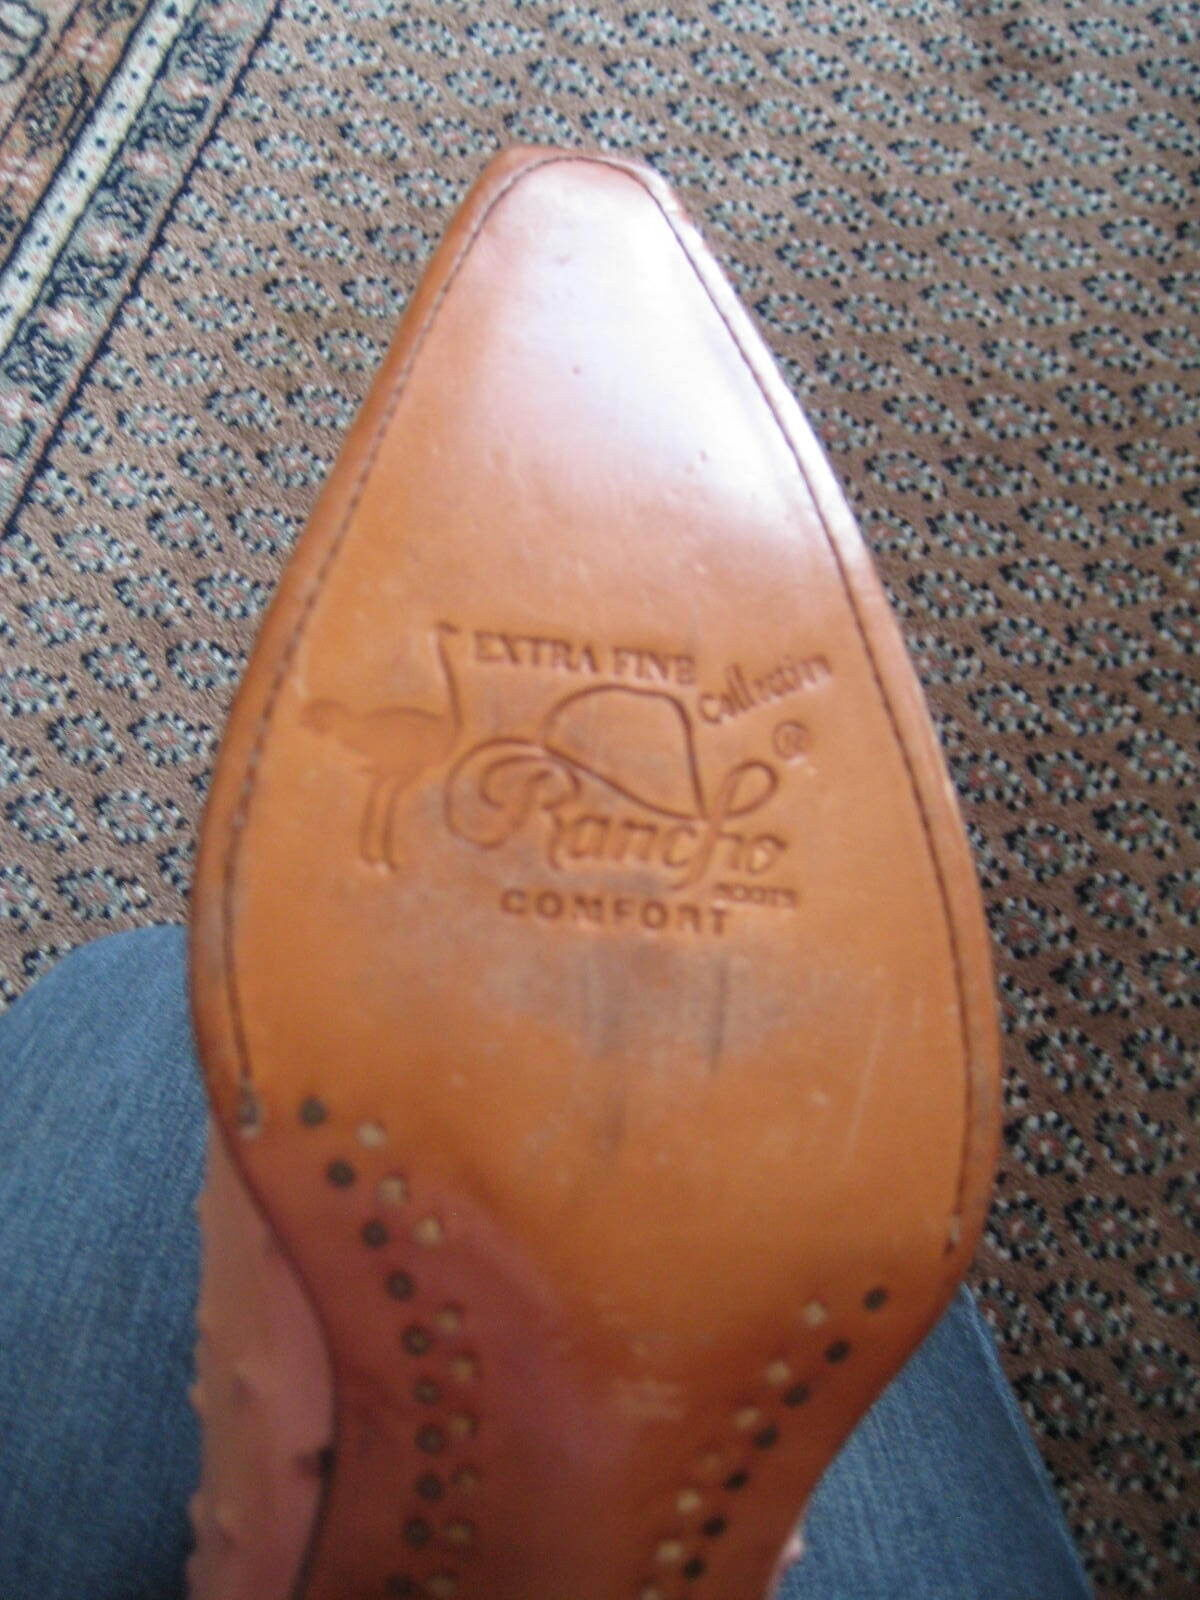 RANCHO Comfort Westernstiefel Fine Line Westernstiefel Comfort / Stiefel Strauss rosa  Damen Gr. 37  NEU 185475